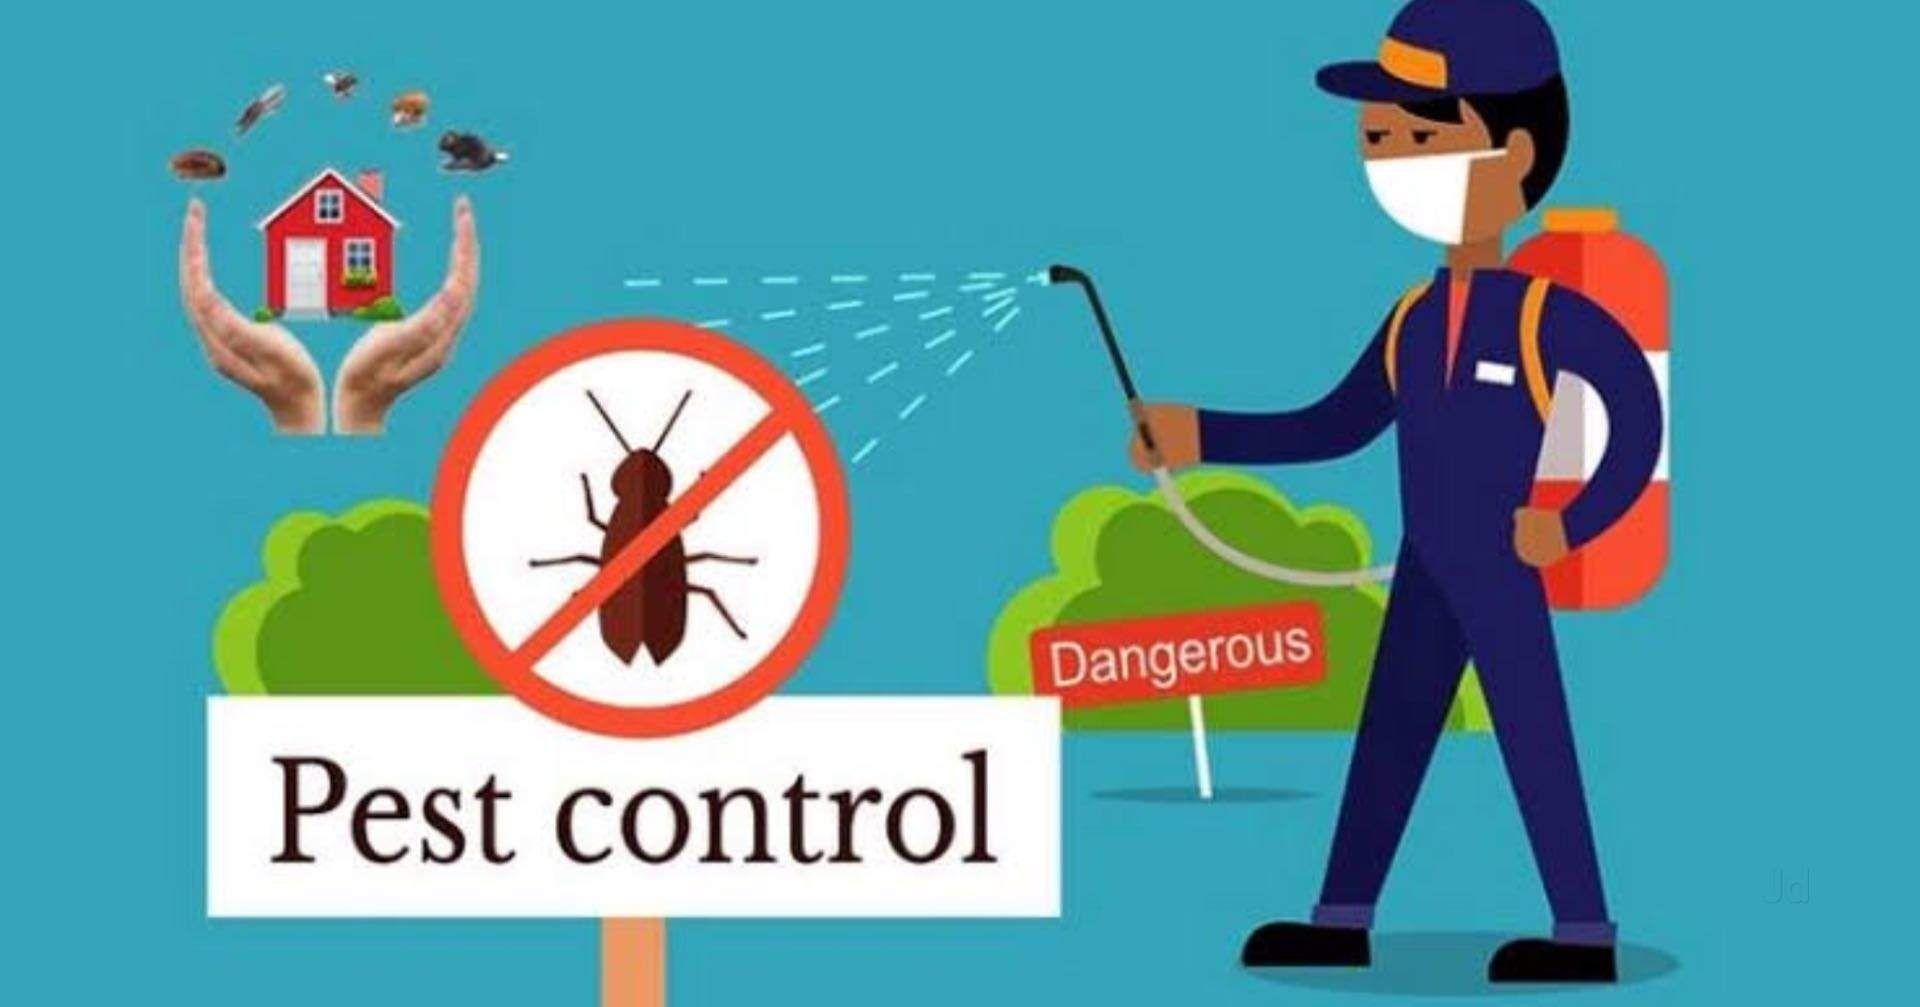 Bug Control: How To Choose A Pest Control Company